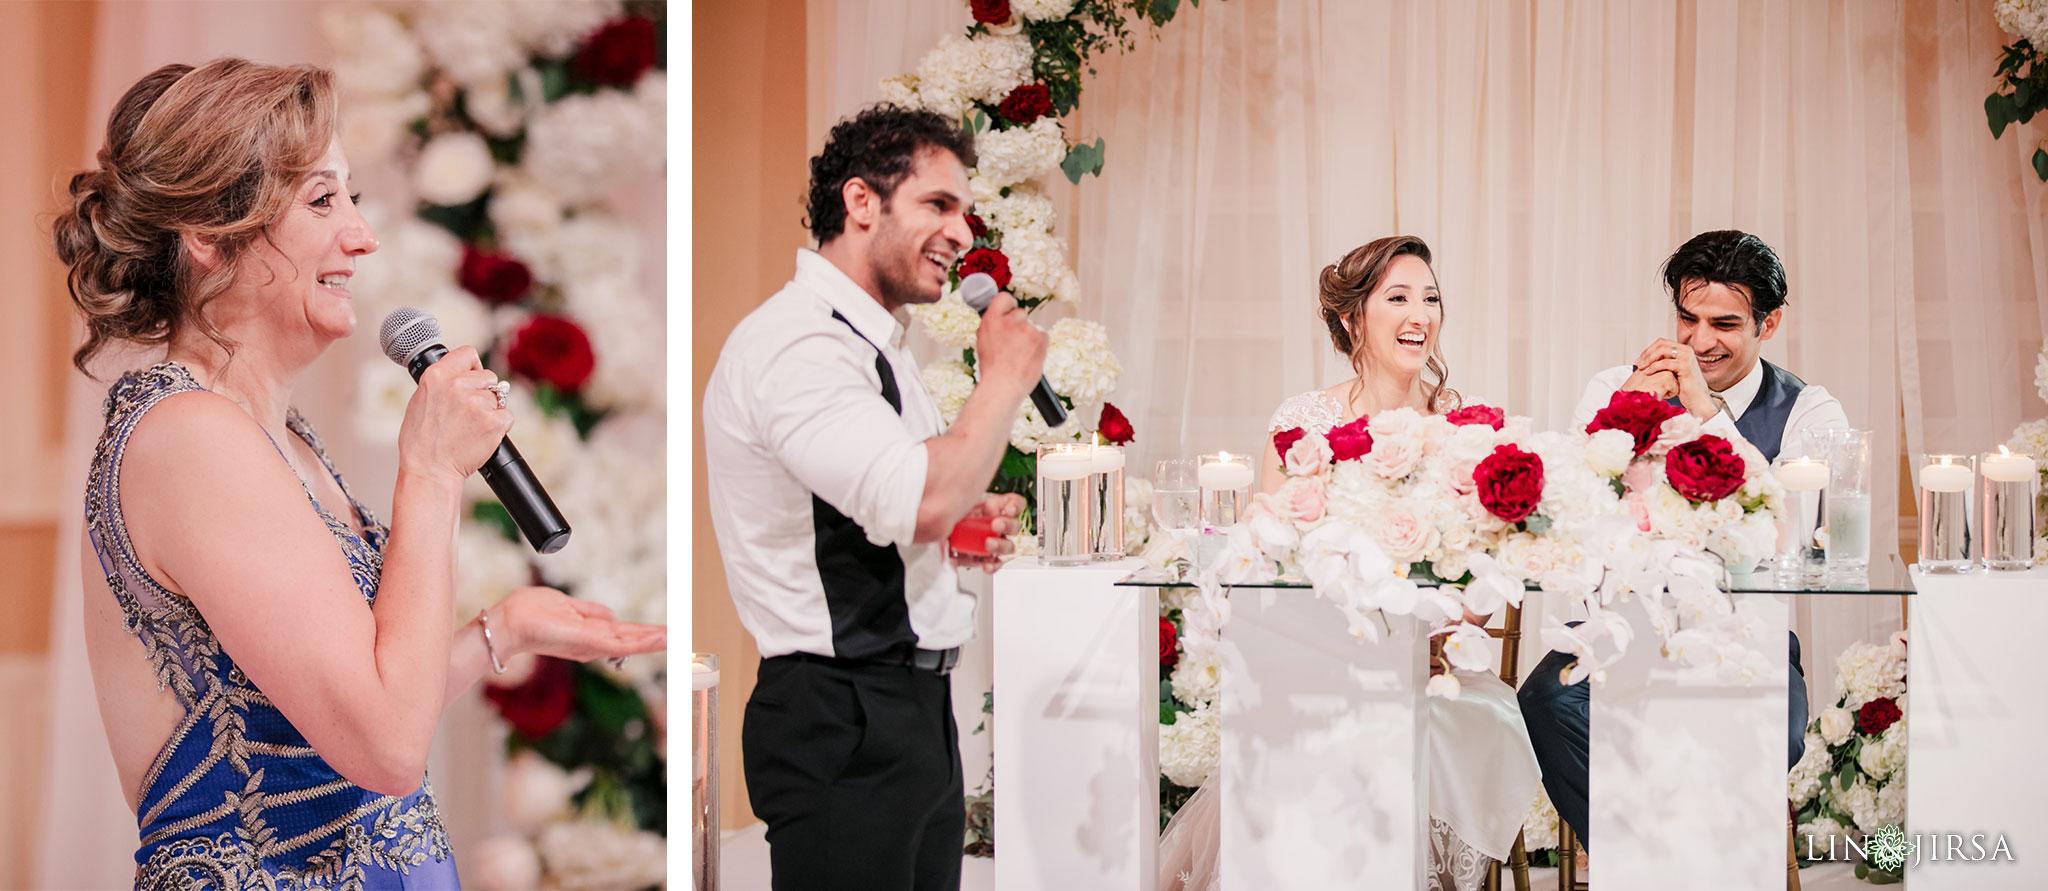 027 taglyan complex los angeles persian wedding photography